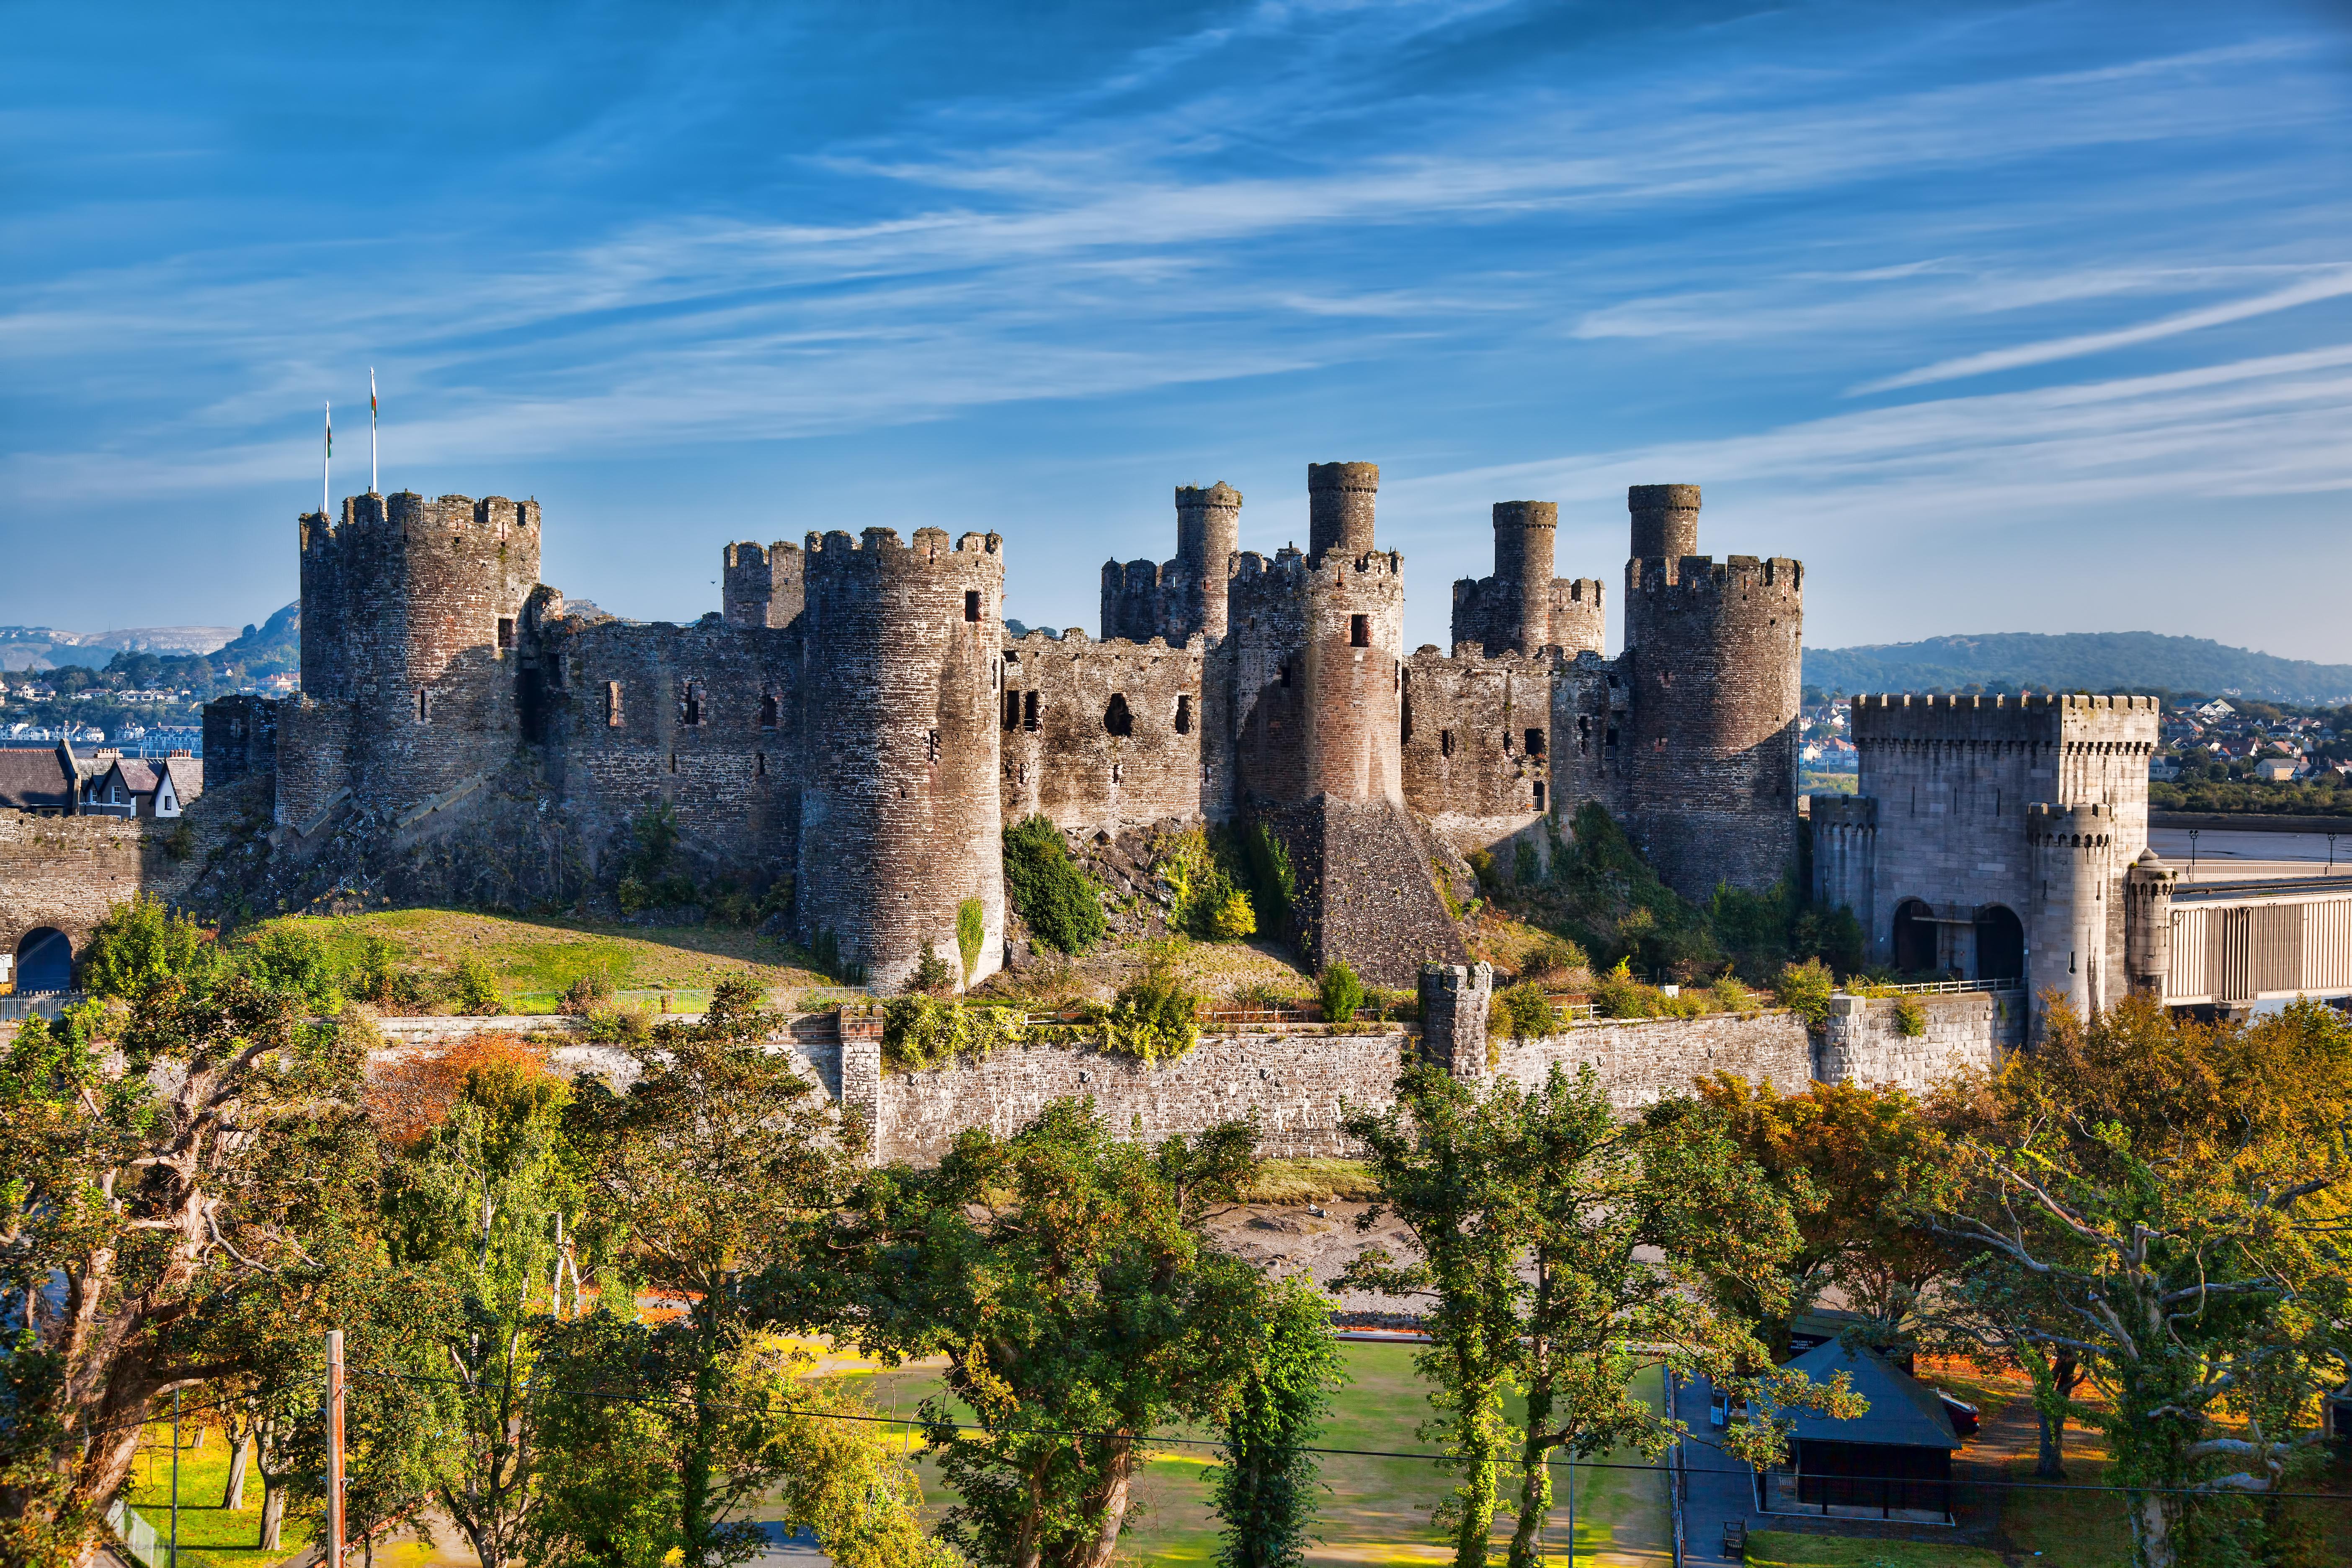 most impressive castles conwy castle england